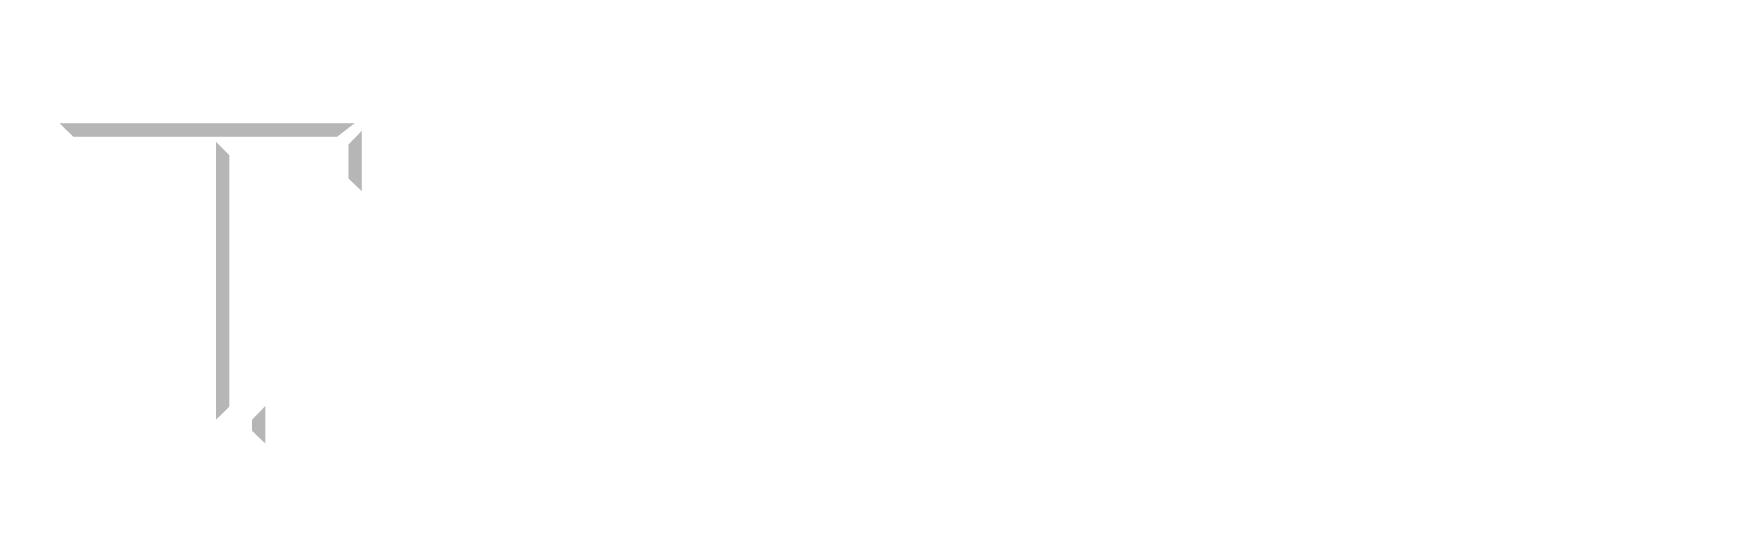 12th Man Technology